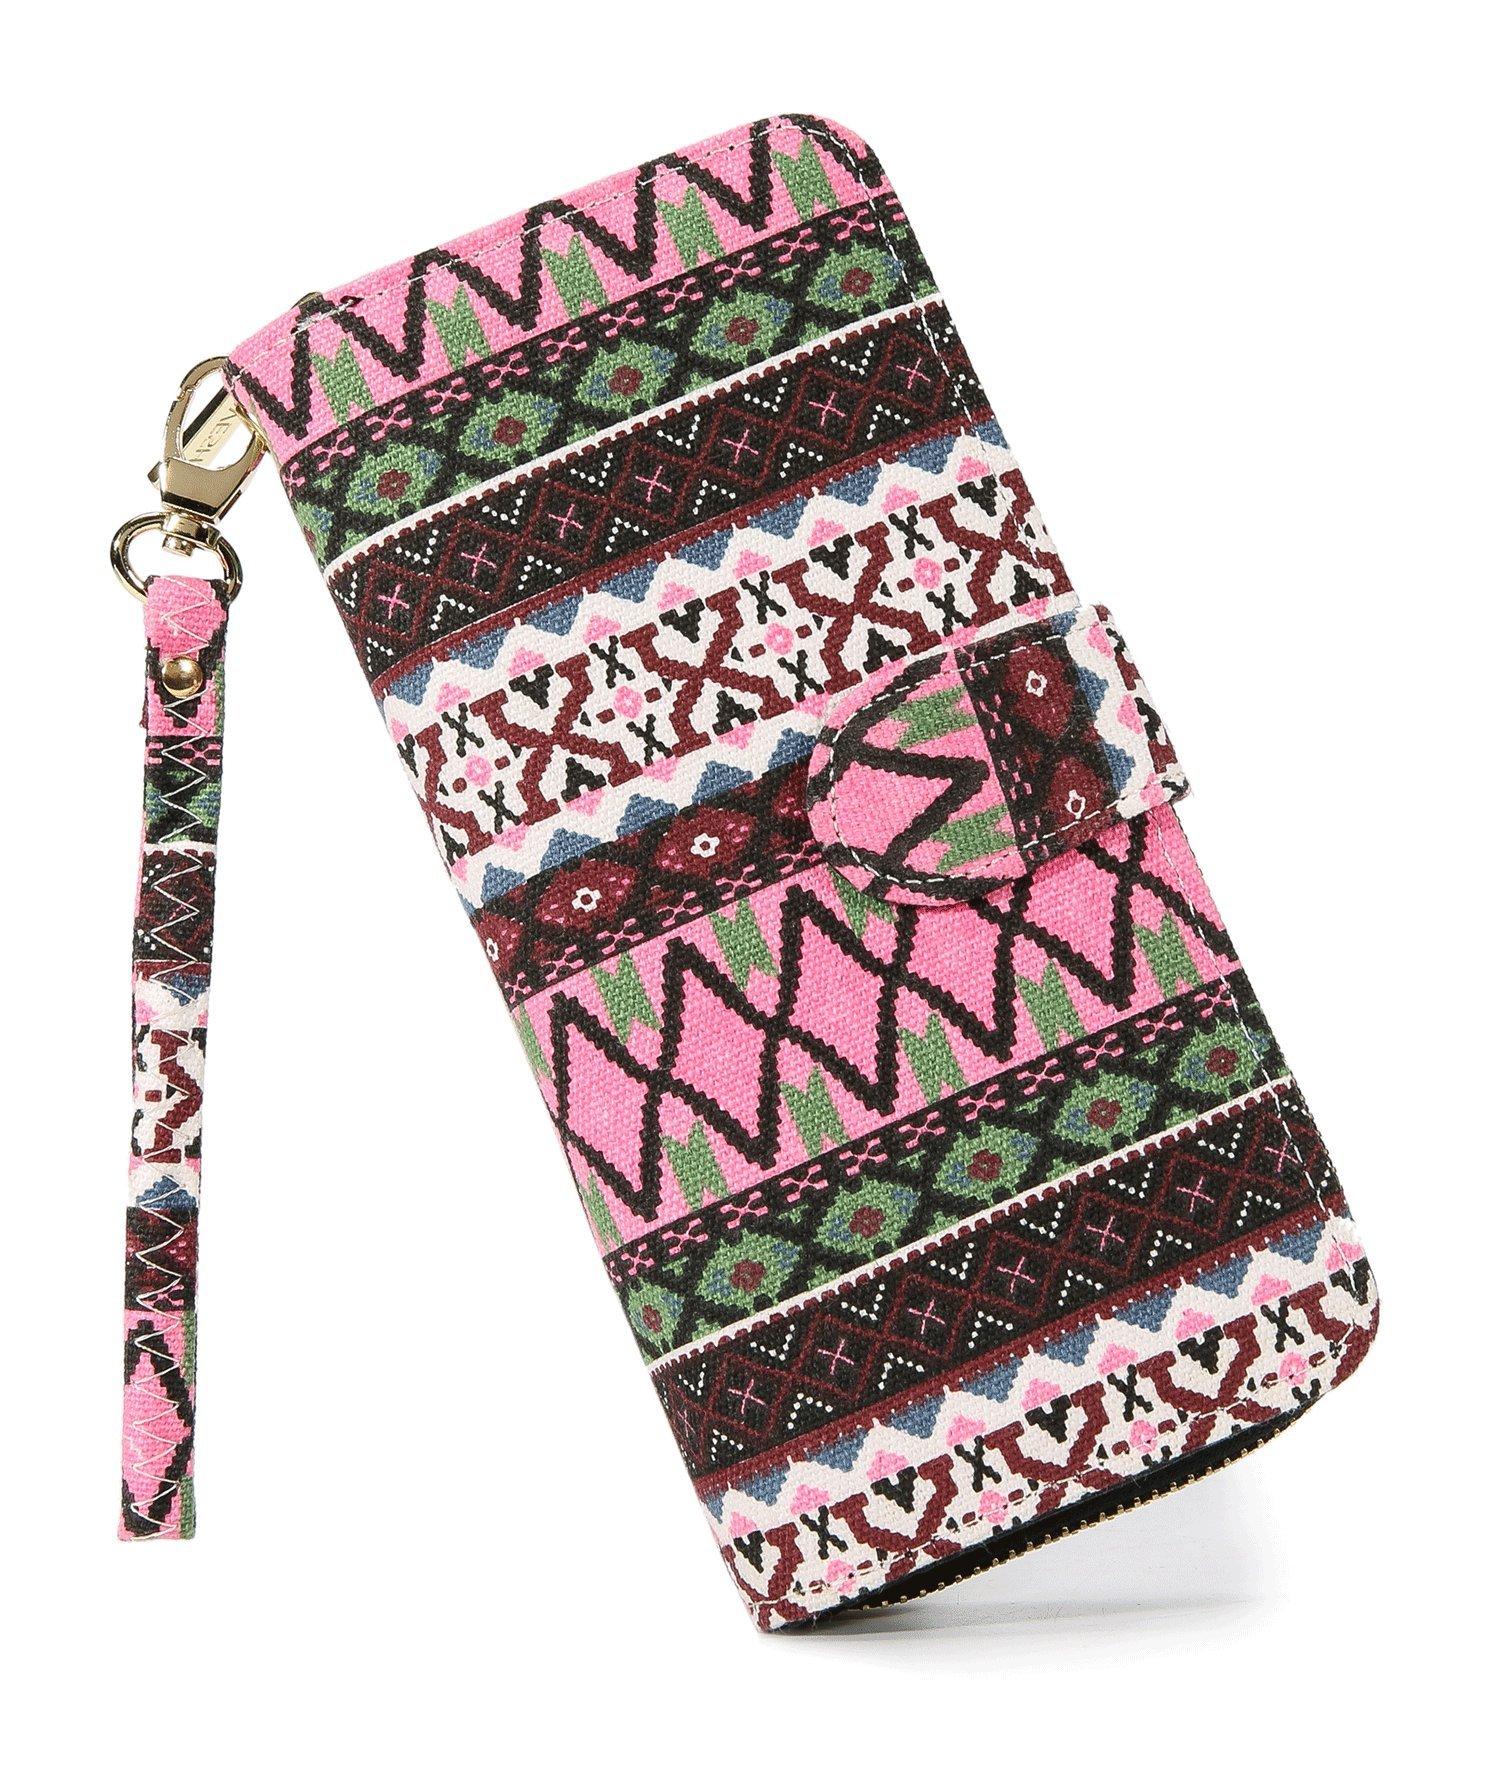 LOVESHE Women's New Design Bohemian Style Purse Clutch Bag Card Holder New Fashion (17X28)